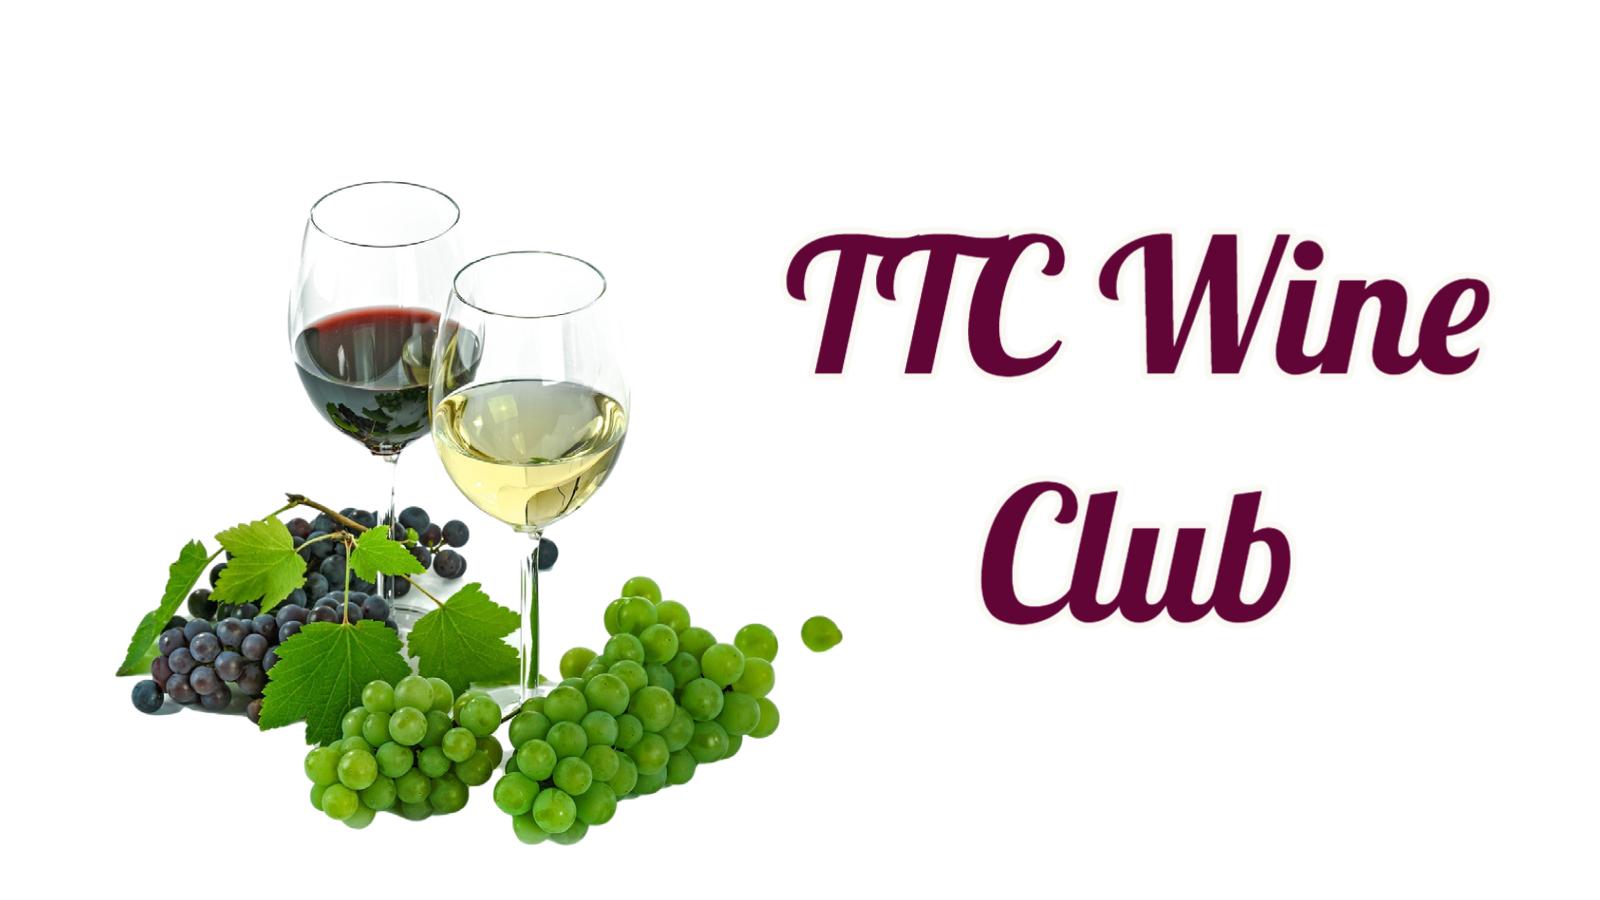 Ttc Wine Club